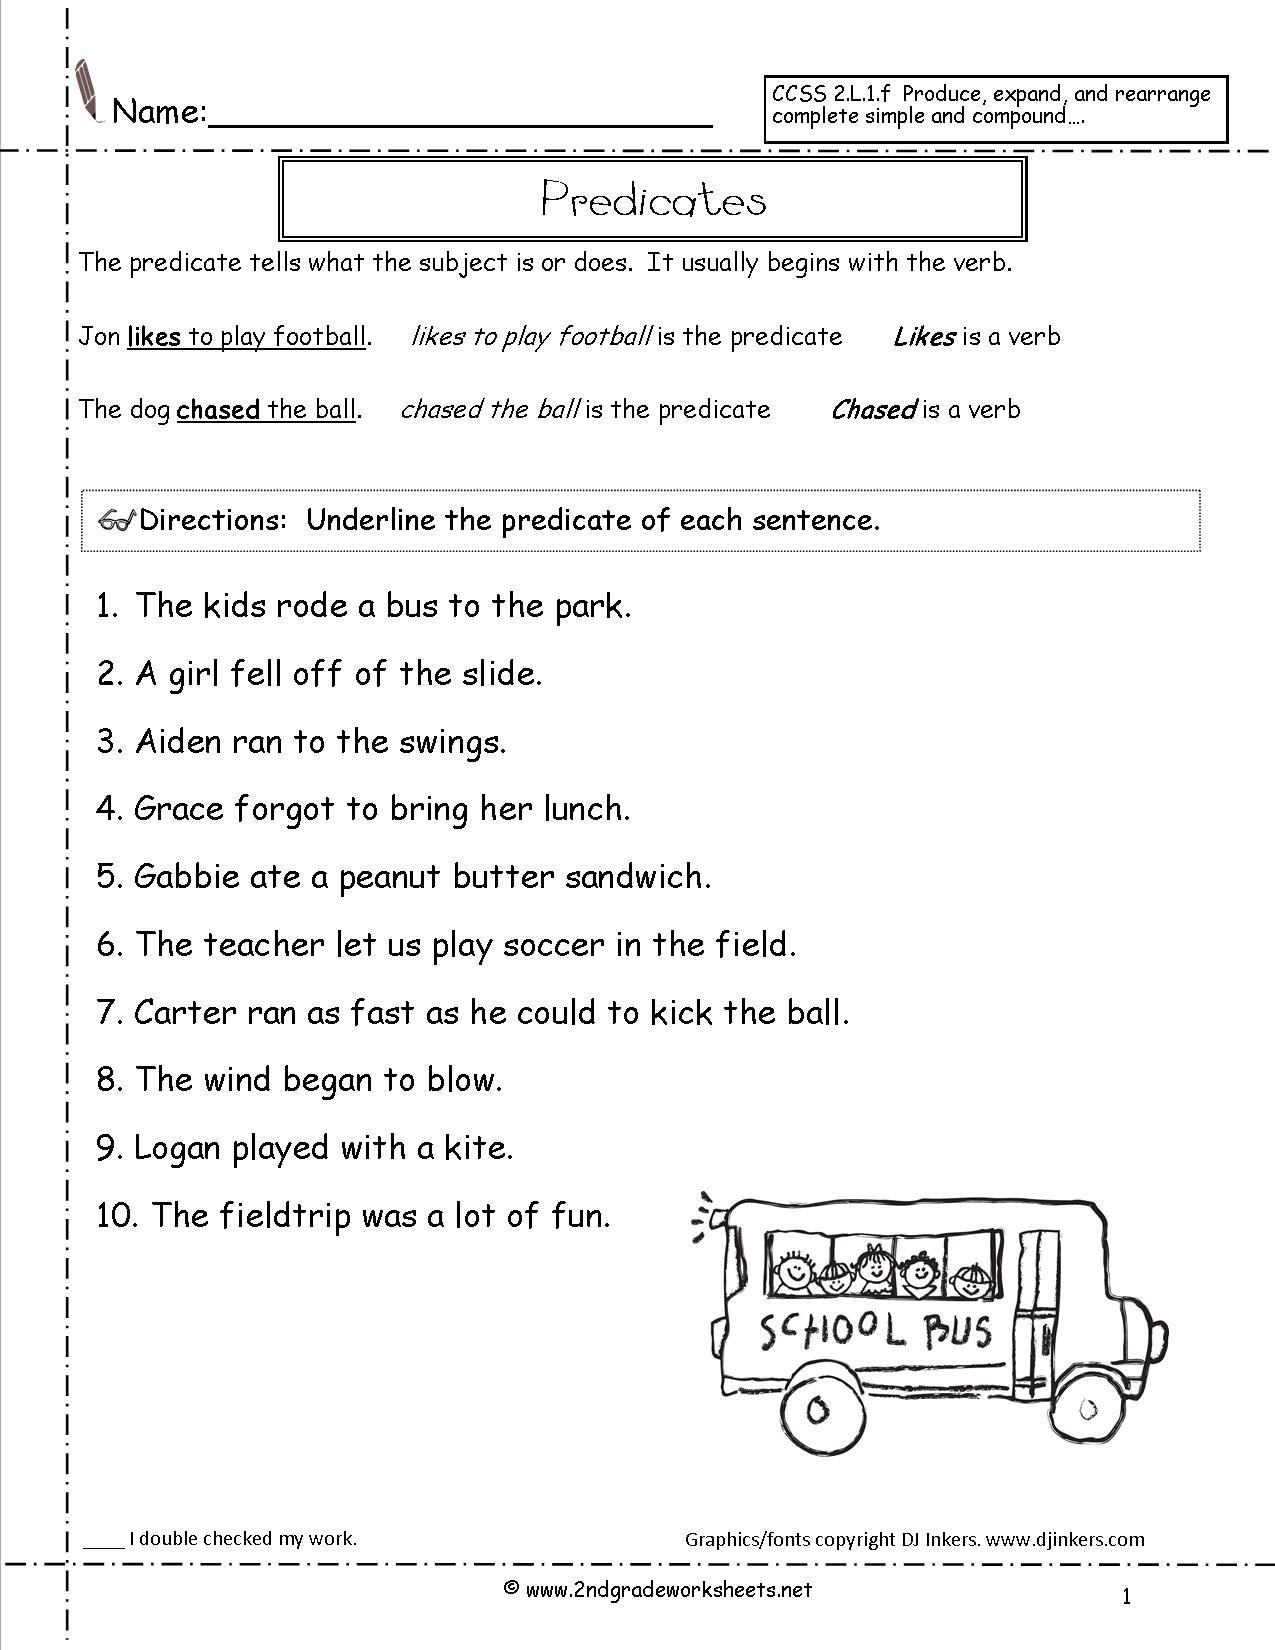 Second Grade Sentences Worksheets, Ccss 2.l.1.f Worksheets. | Free Printable Sentence Correction Worksheets